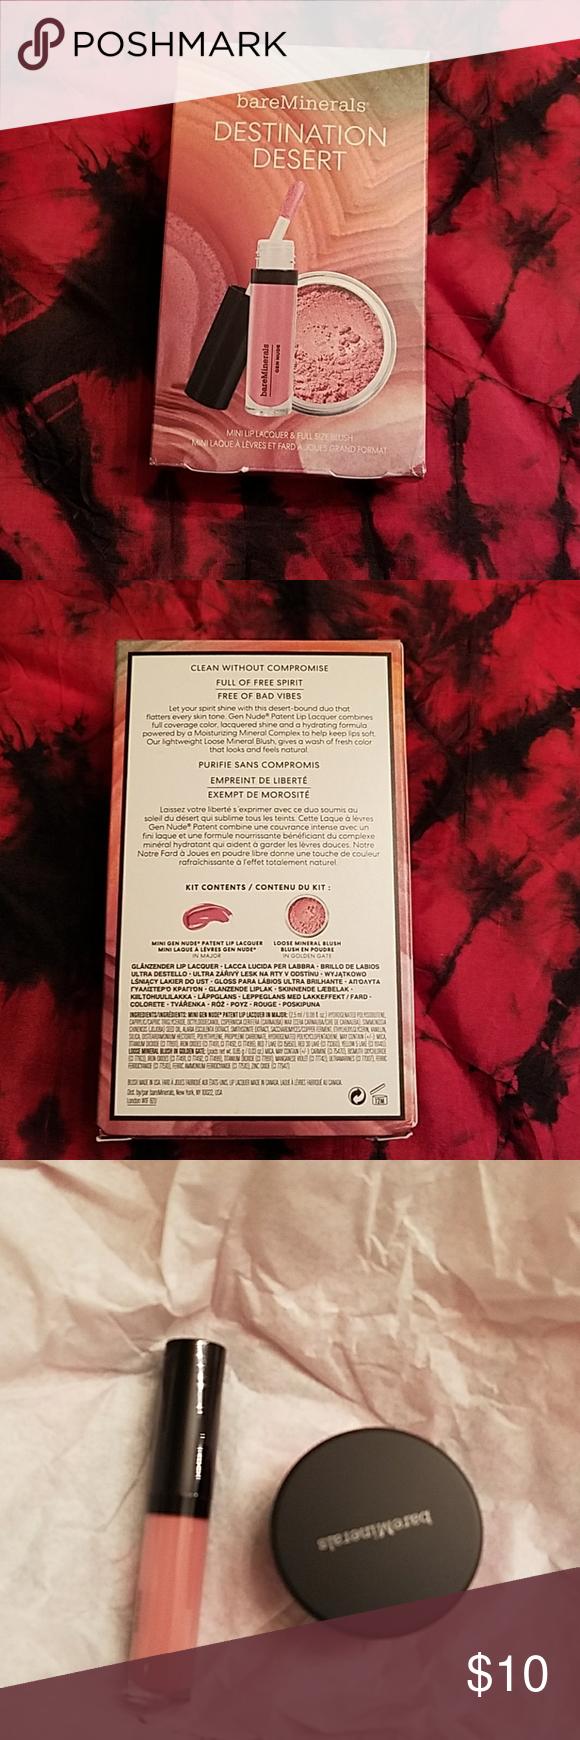 3 for $20🌶New Bare Minerals Lip/Blush set NWT in 2020 ...